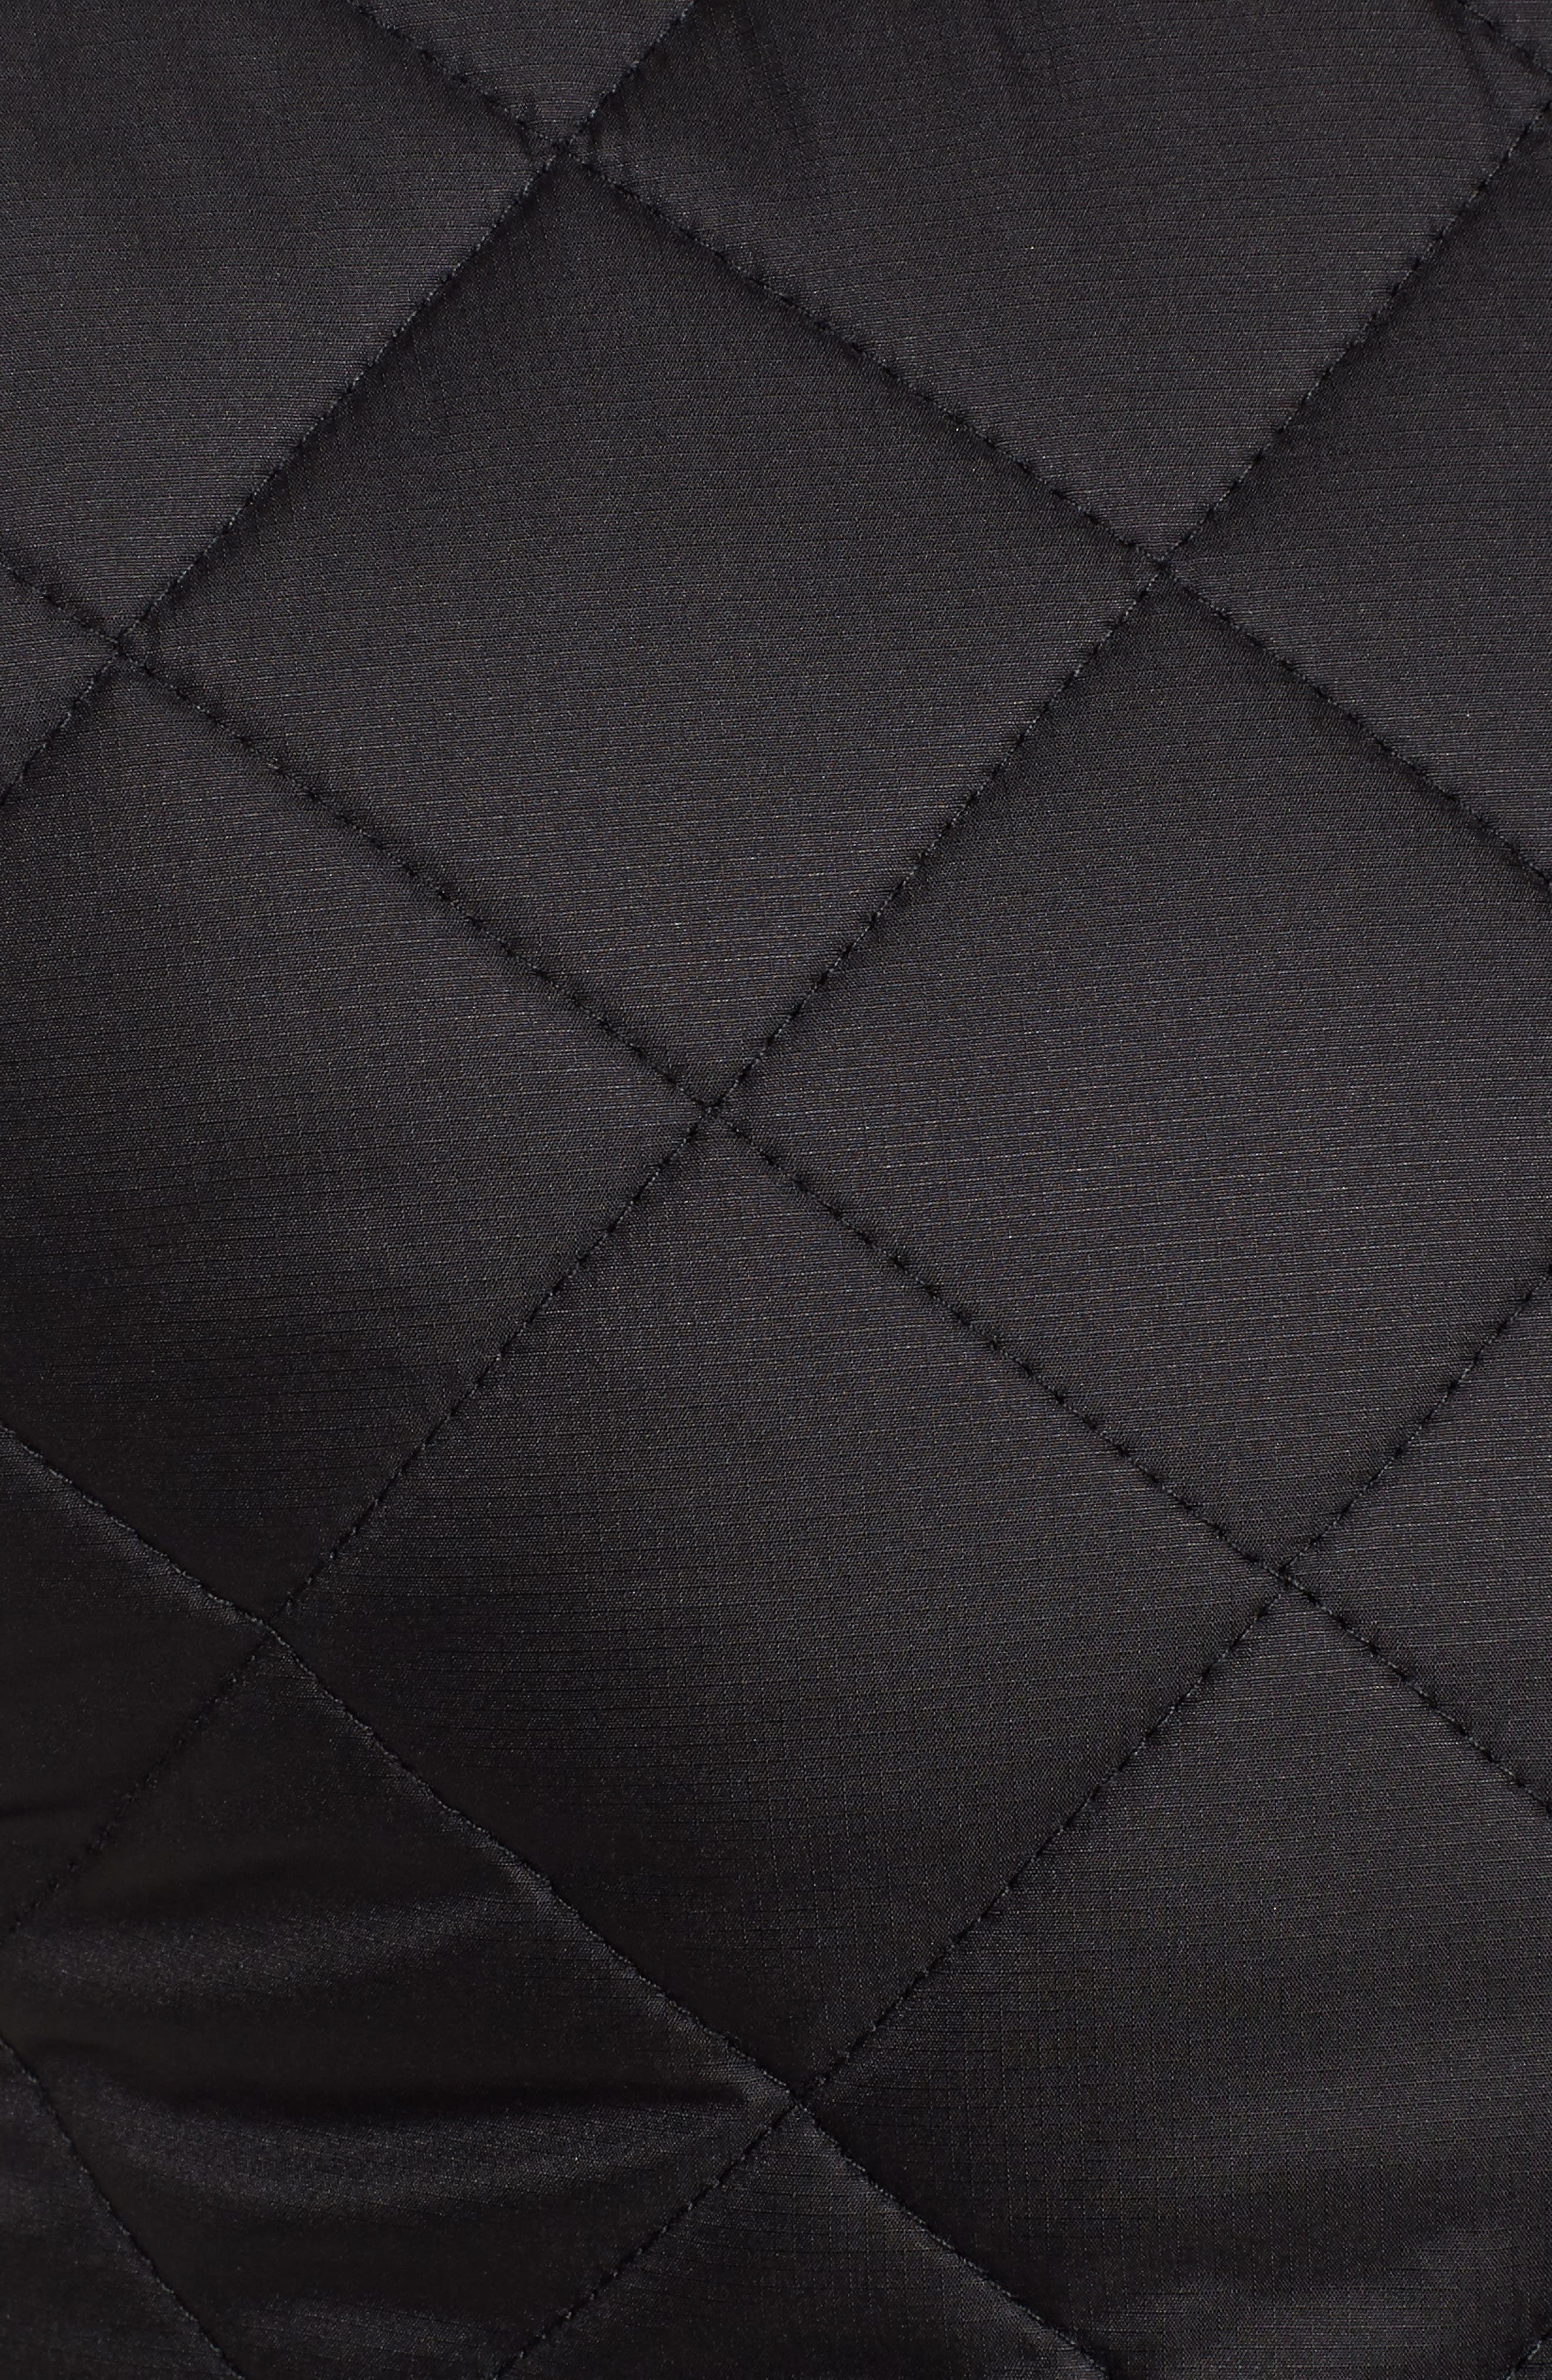 Cuchillo Insulated Vest,                             Alternate thumbnail 6, color,                             001